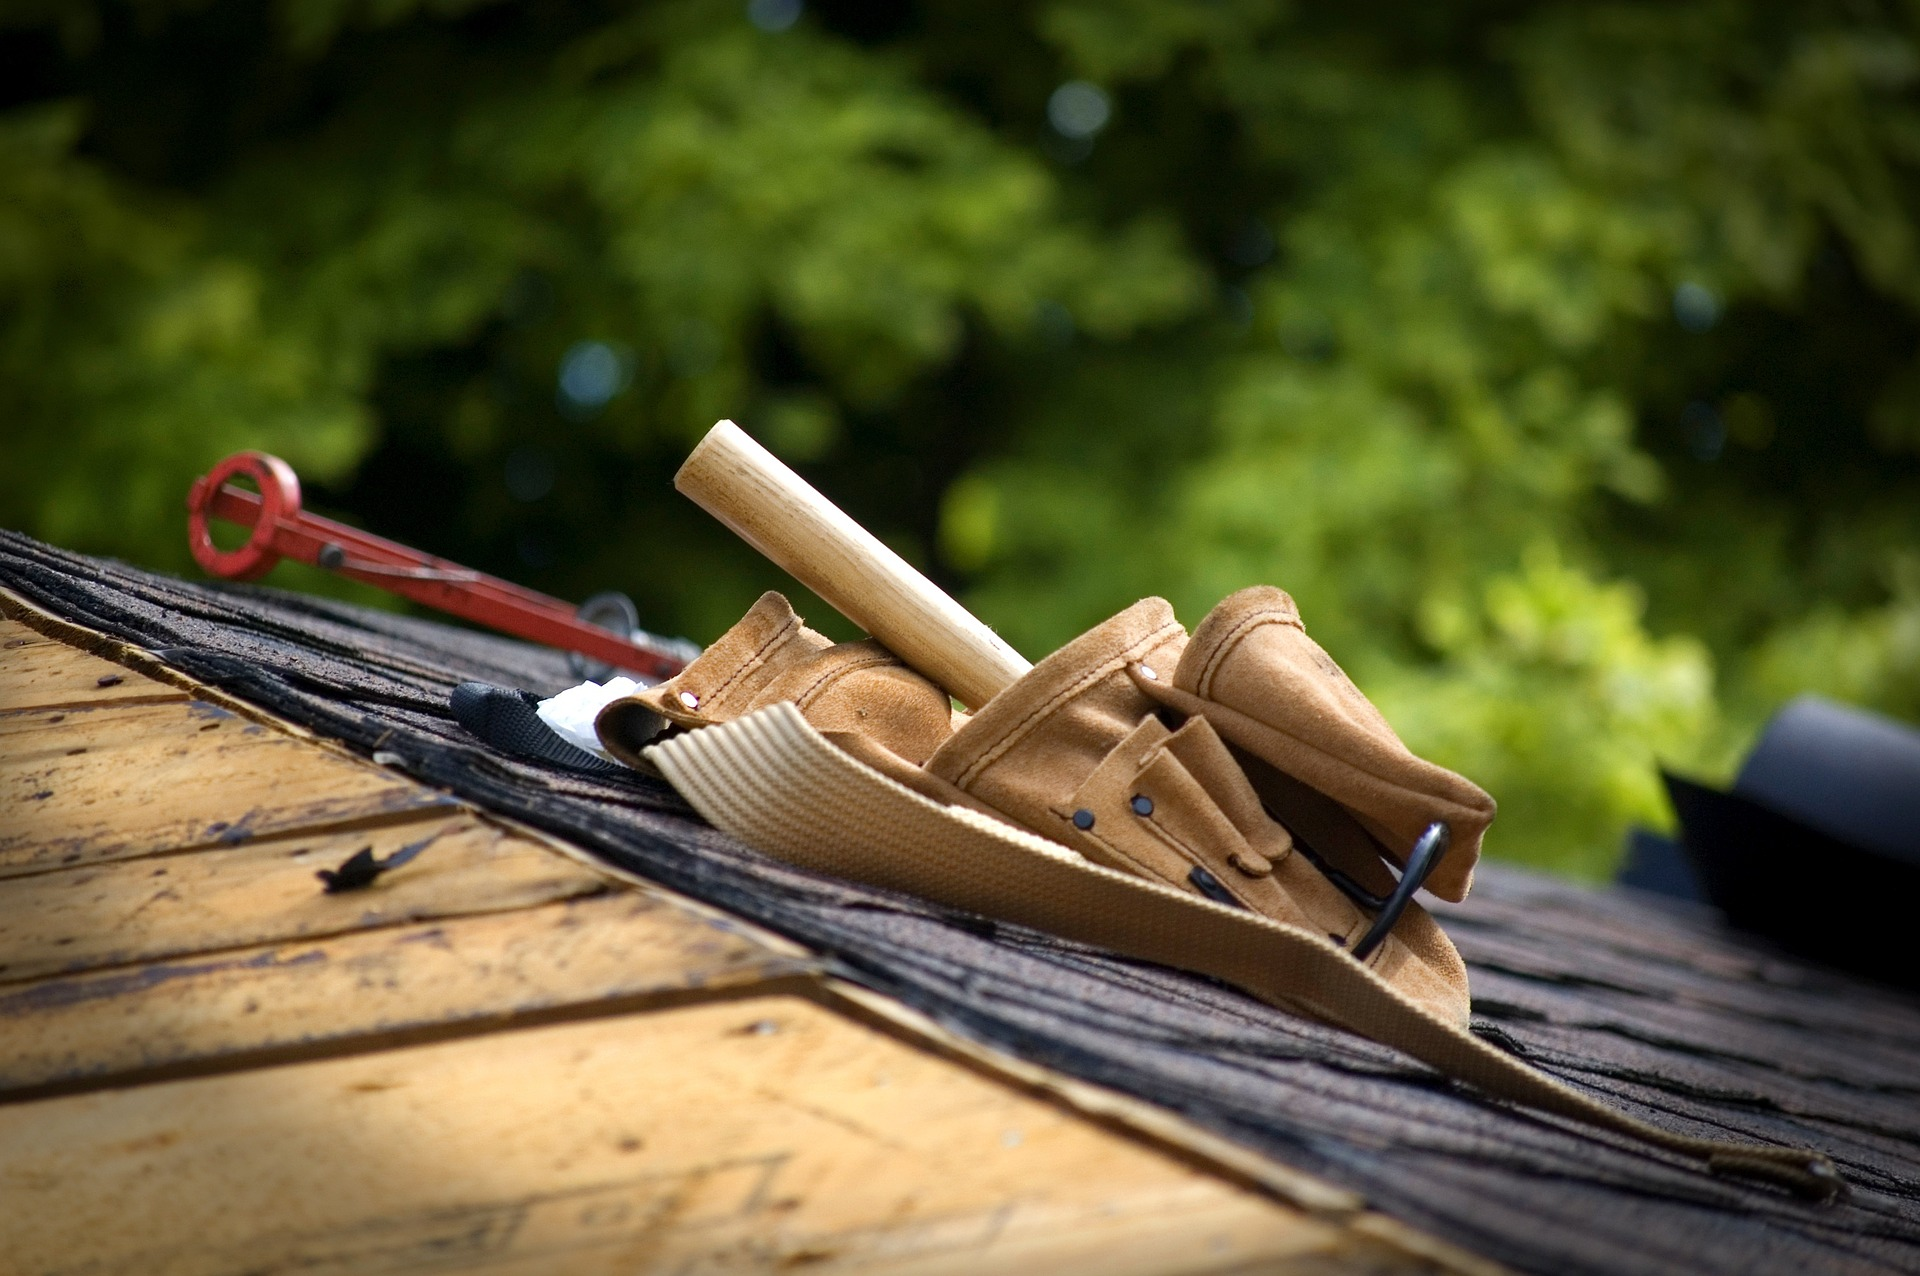 12-tool-belt-739152_1920_renover durable